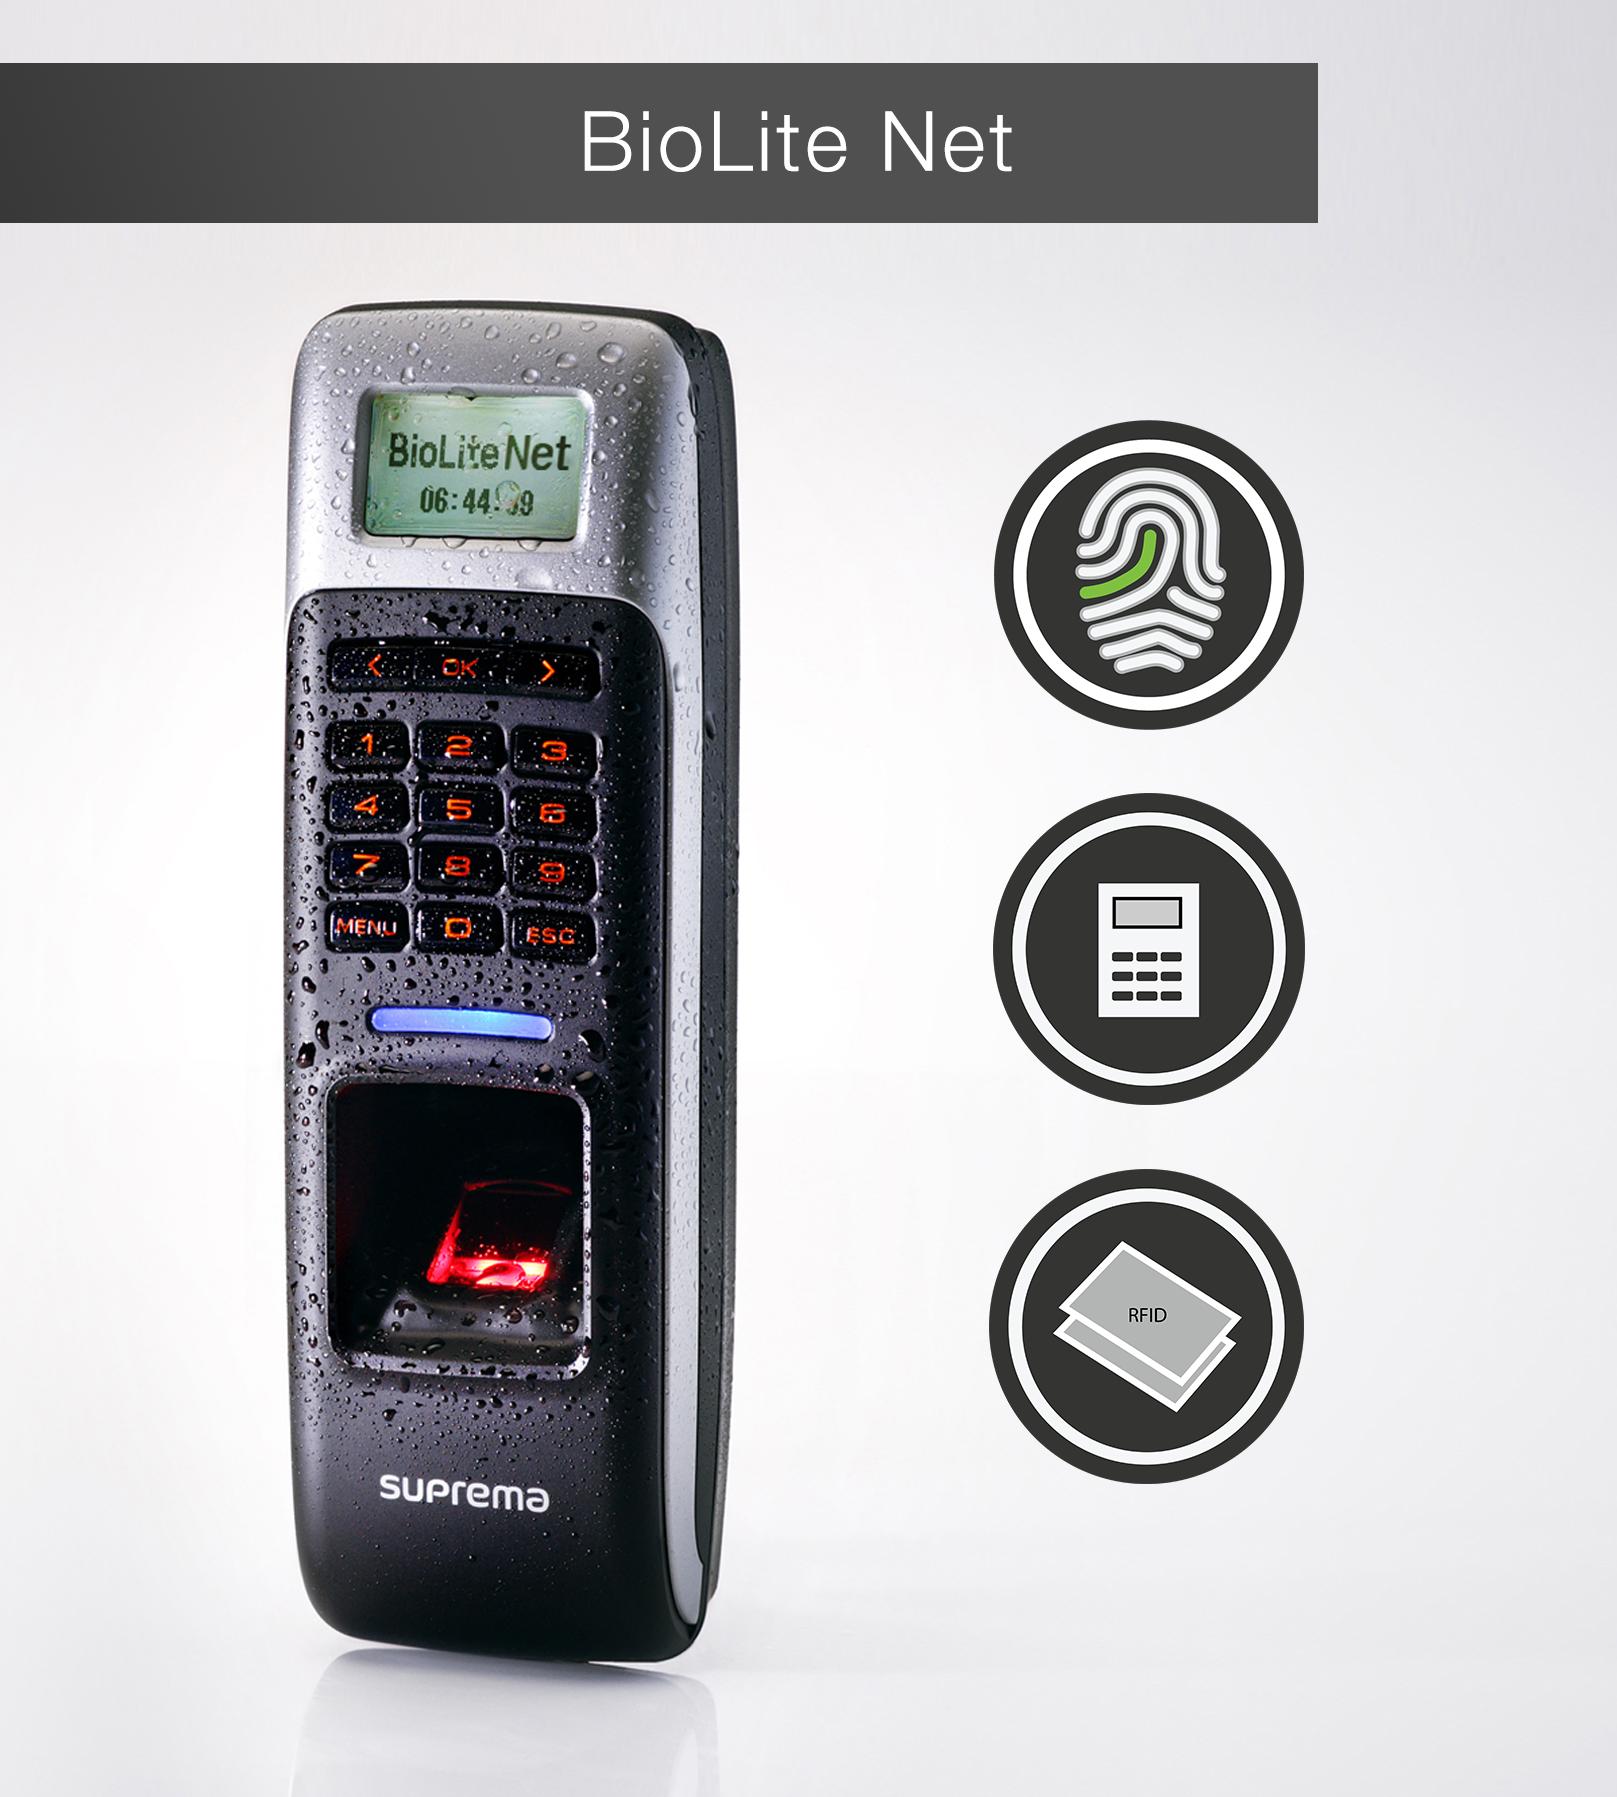 BioLite_Net_Main.png